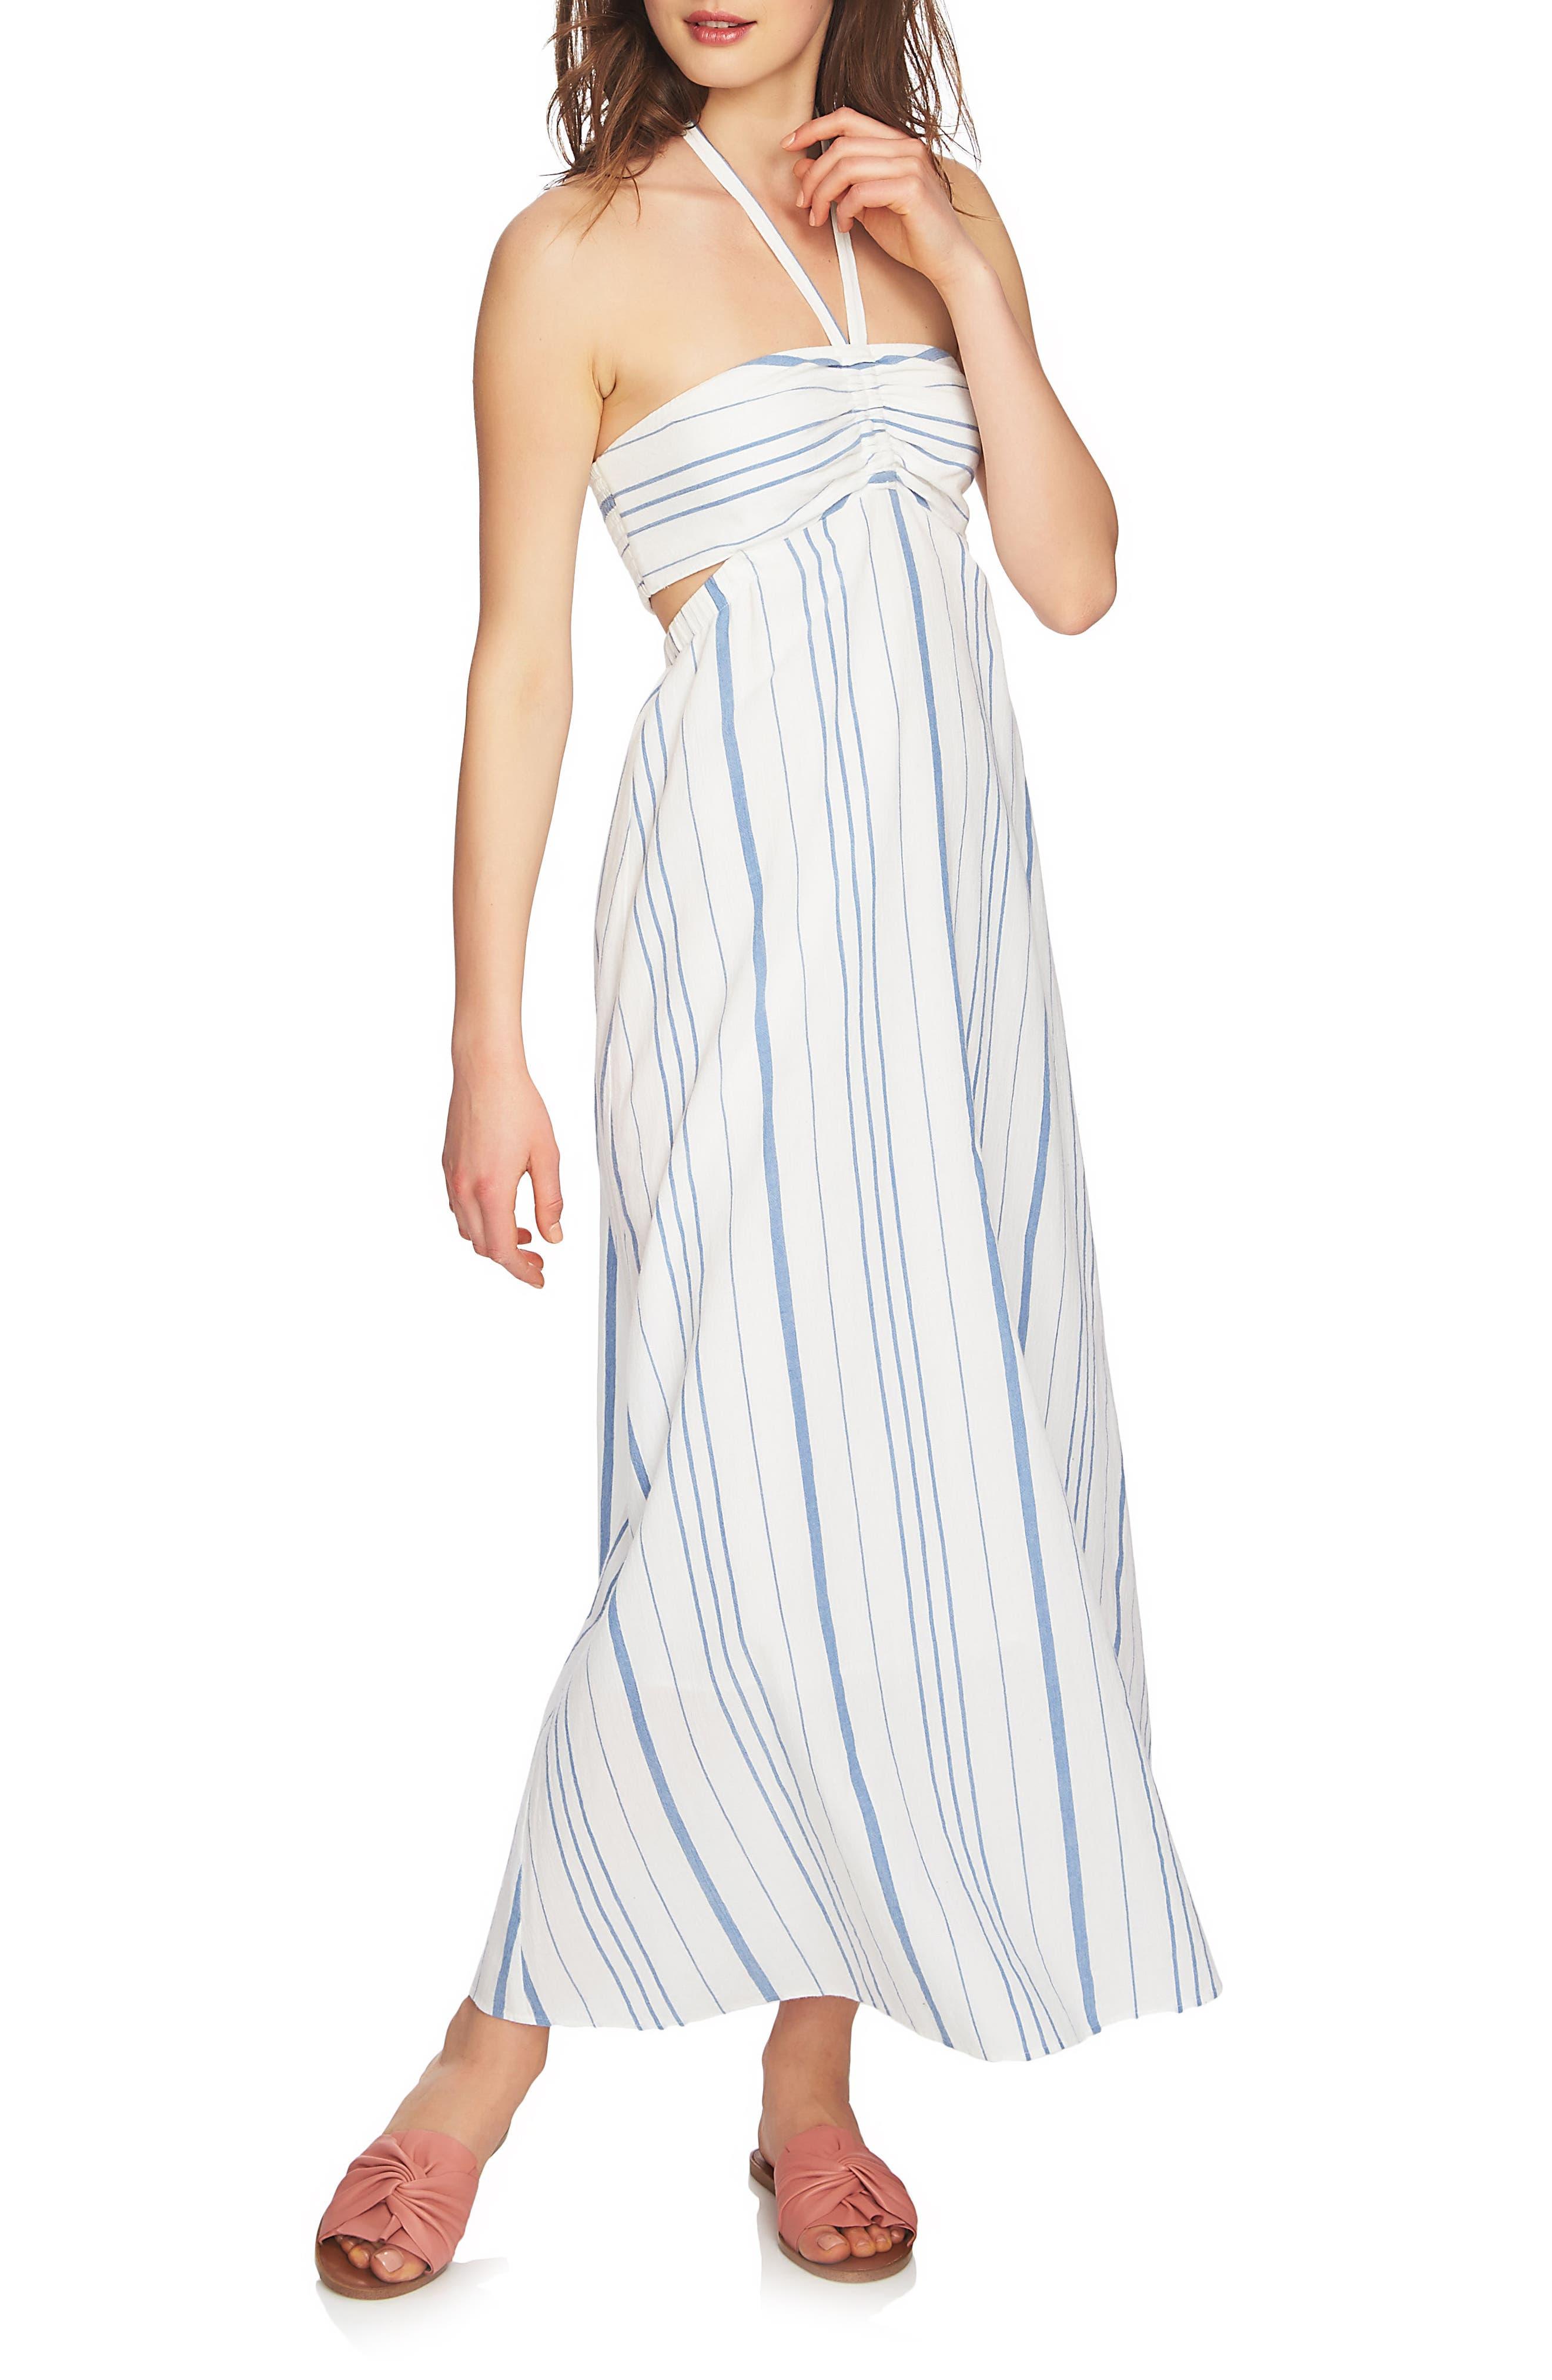 Cinched Bodice Maxi Dress,                             Main thumbnail 1, color,                             Antique White